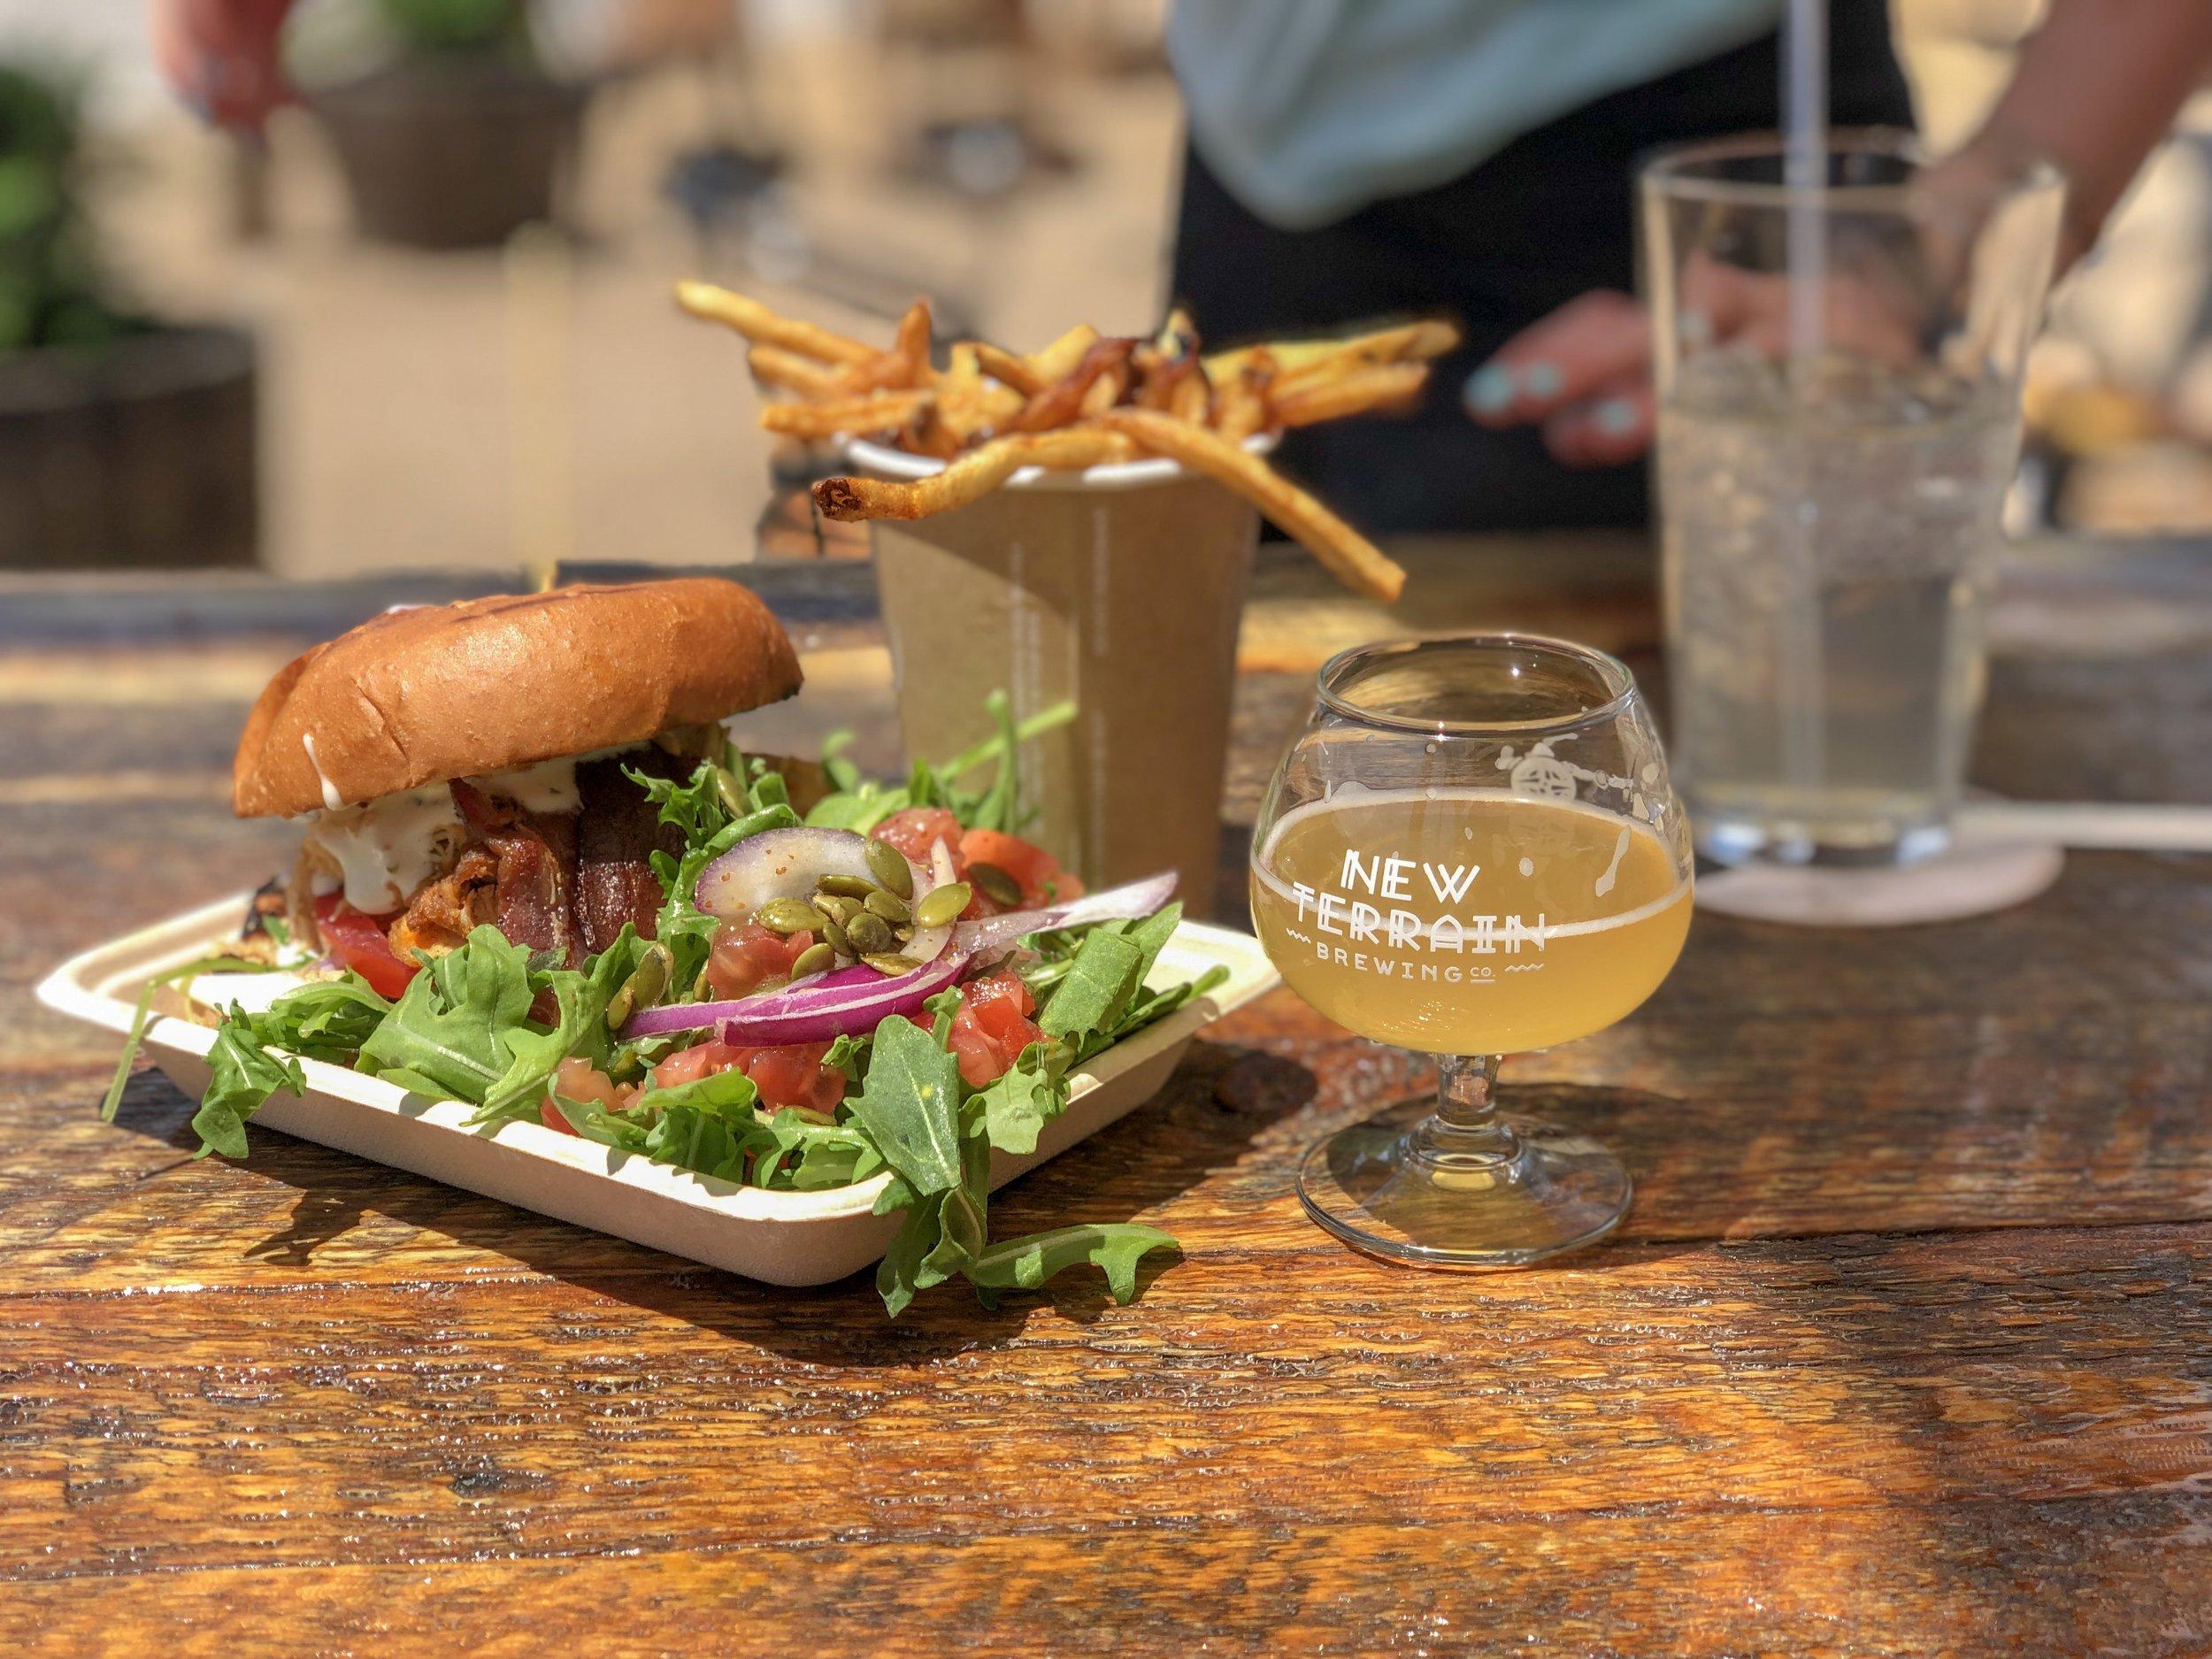 Farm to Truck delicious food truck grub. ©Suzanne Brown